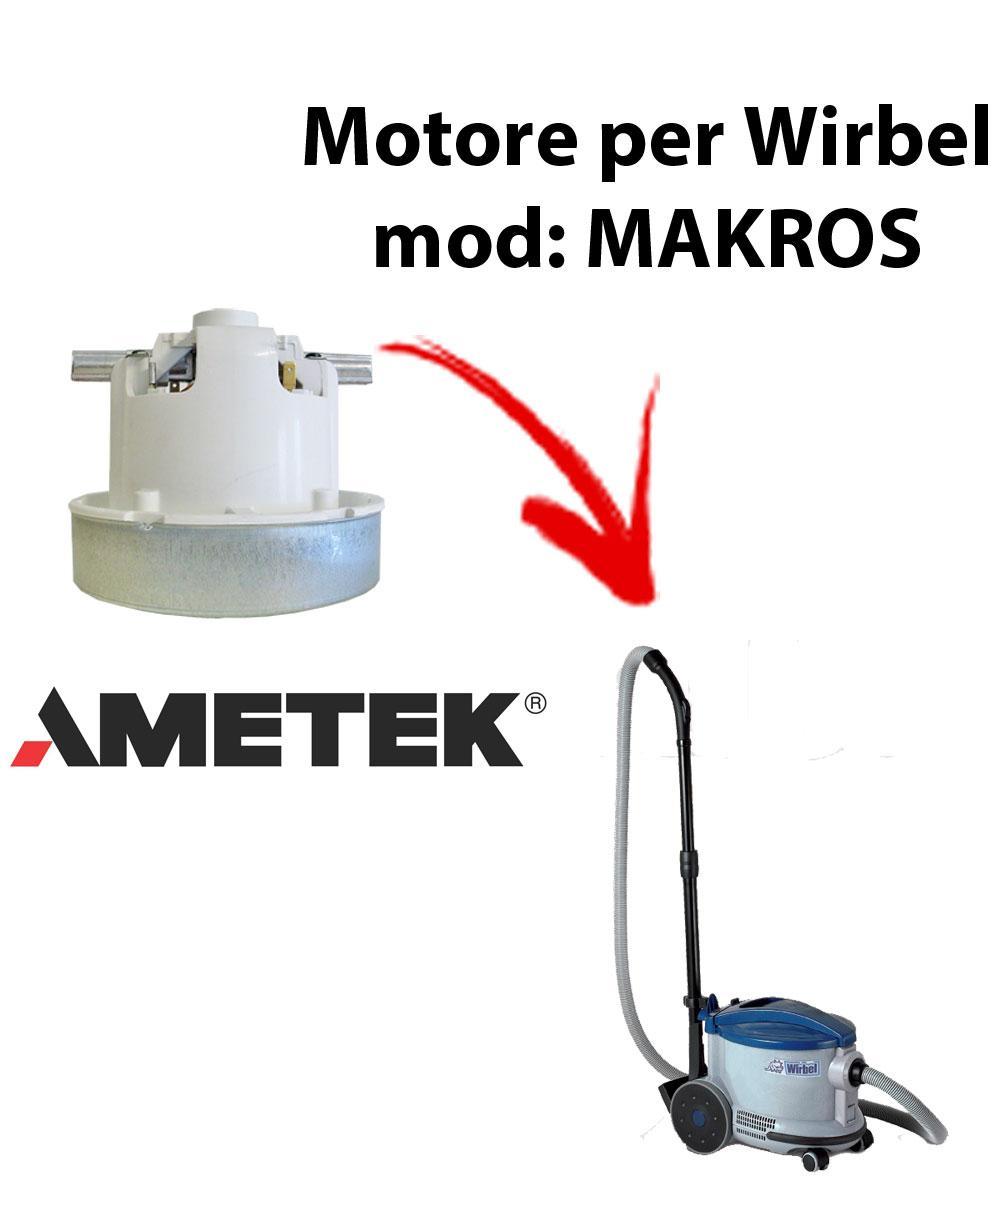 Motore Ametek di aspirazione per Aspirapolvere WIRBEL, modello MAKROS